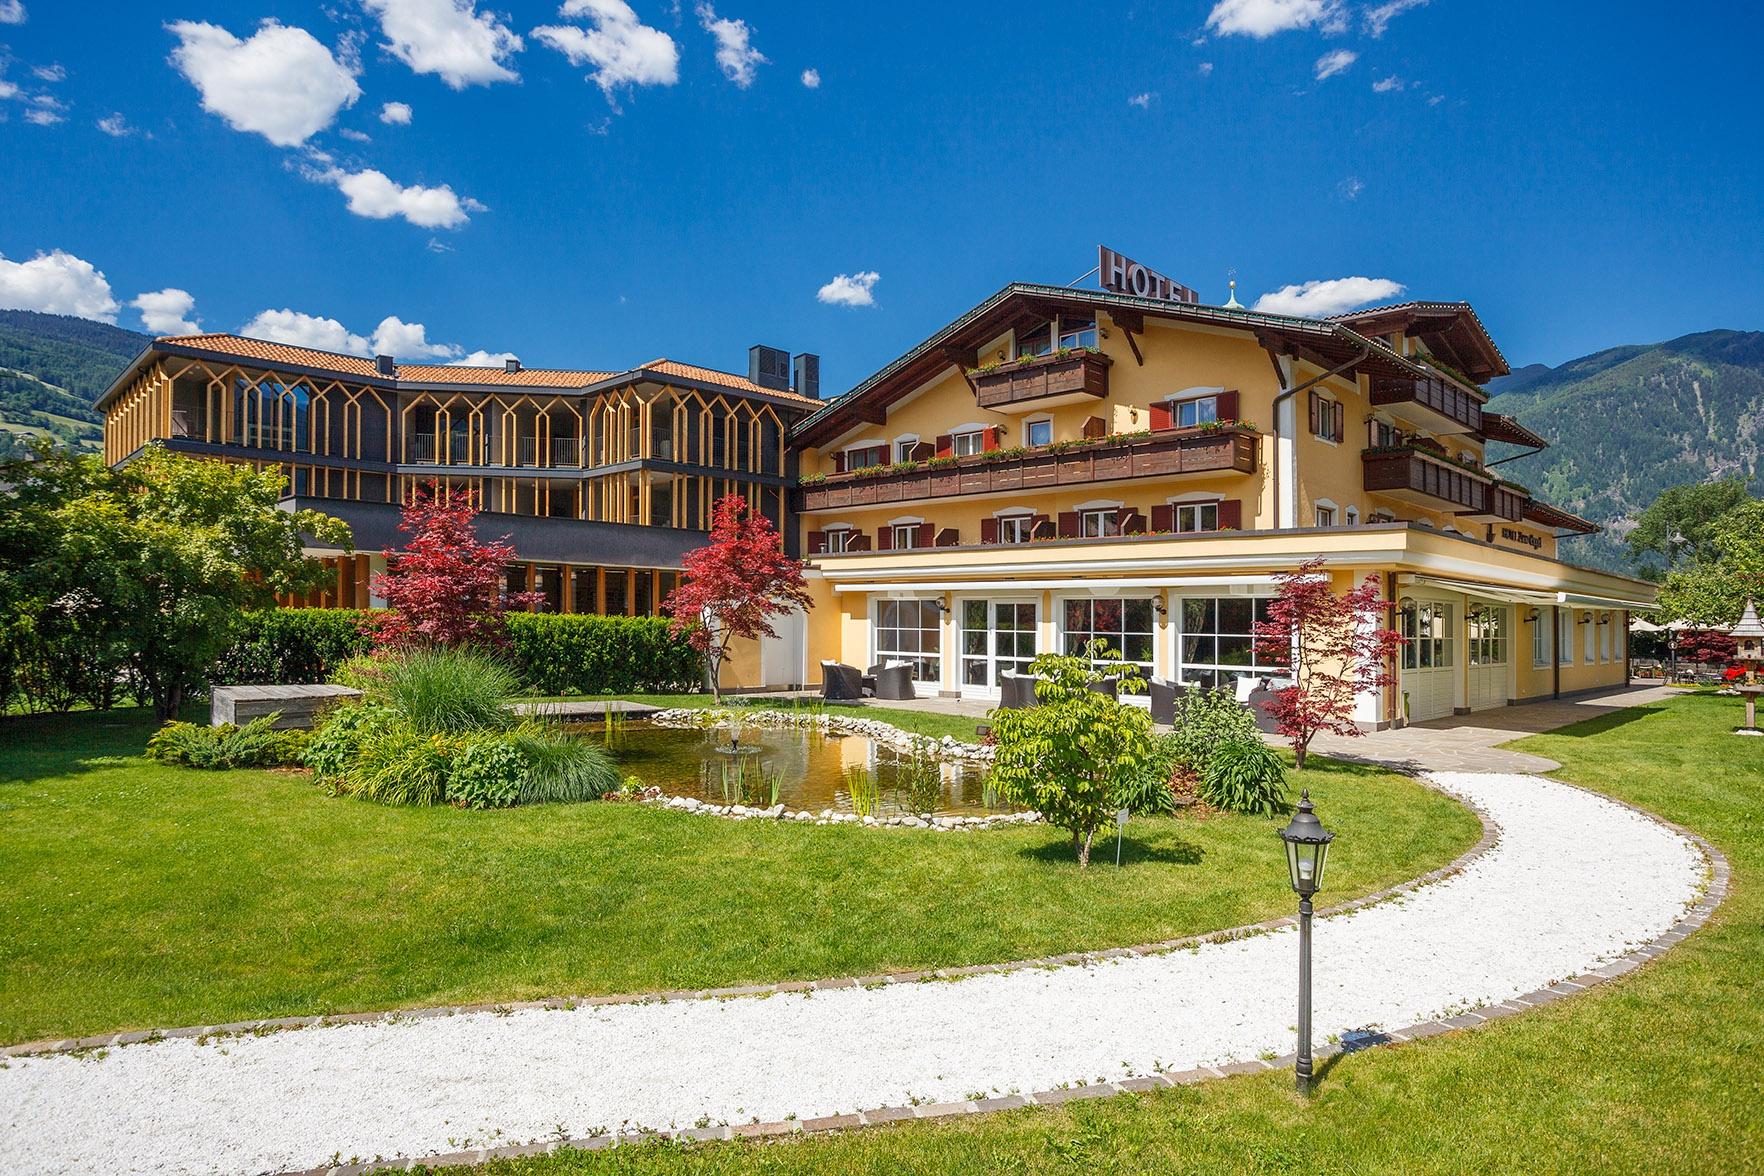 Hotel zum Engel - Vipiteno - Hotel 4 stelle - Alto Adige, Provincia ...